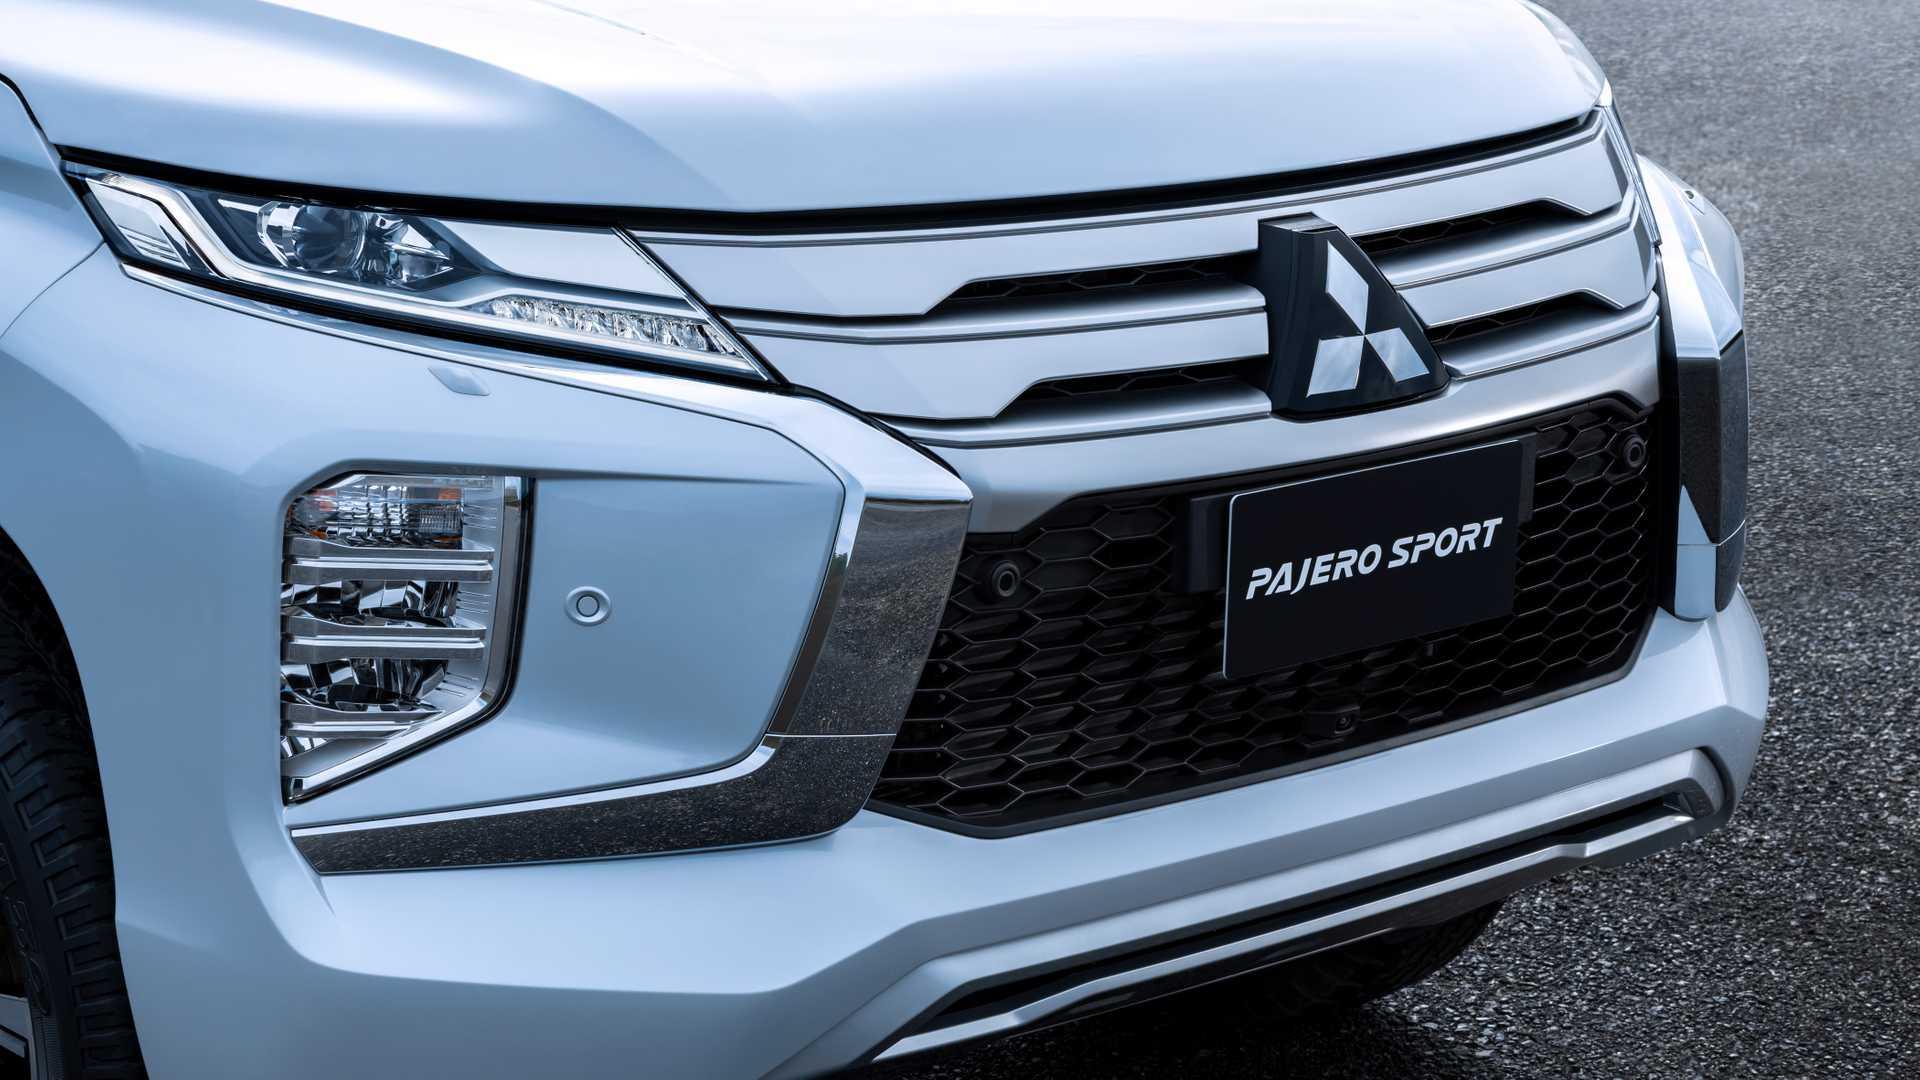 2020-mitsubishi-pajero-sport-facelift-13.jpg